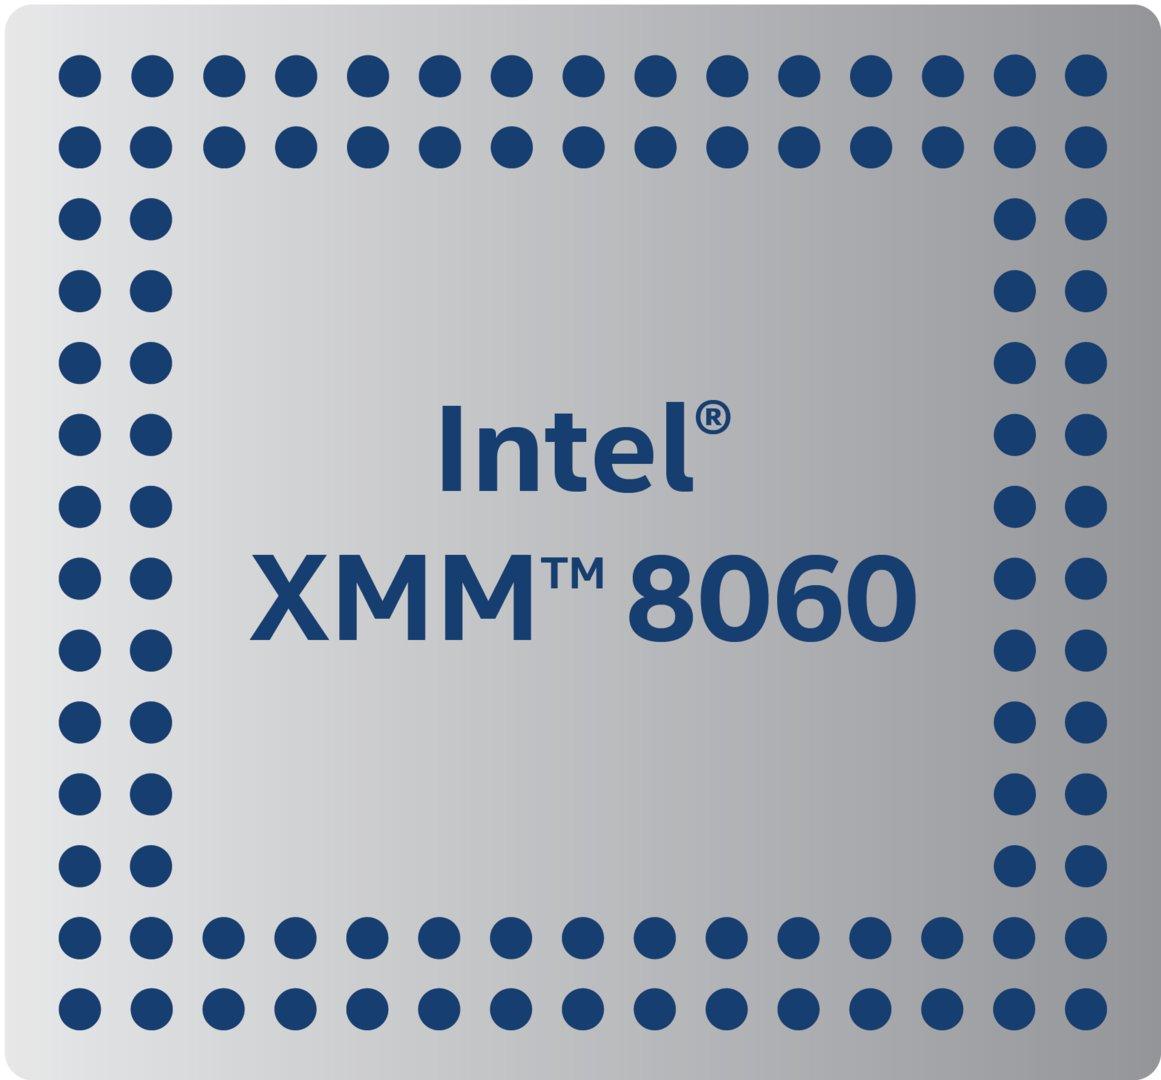 Intel XMM 8060